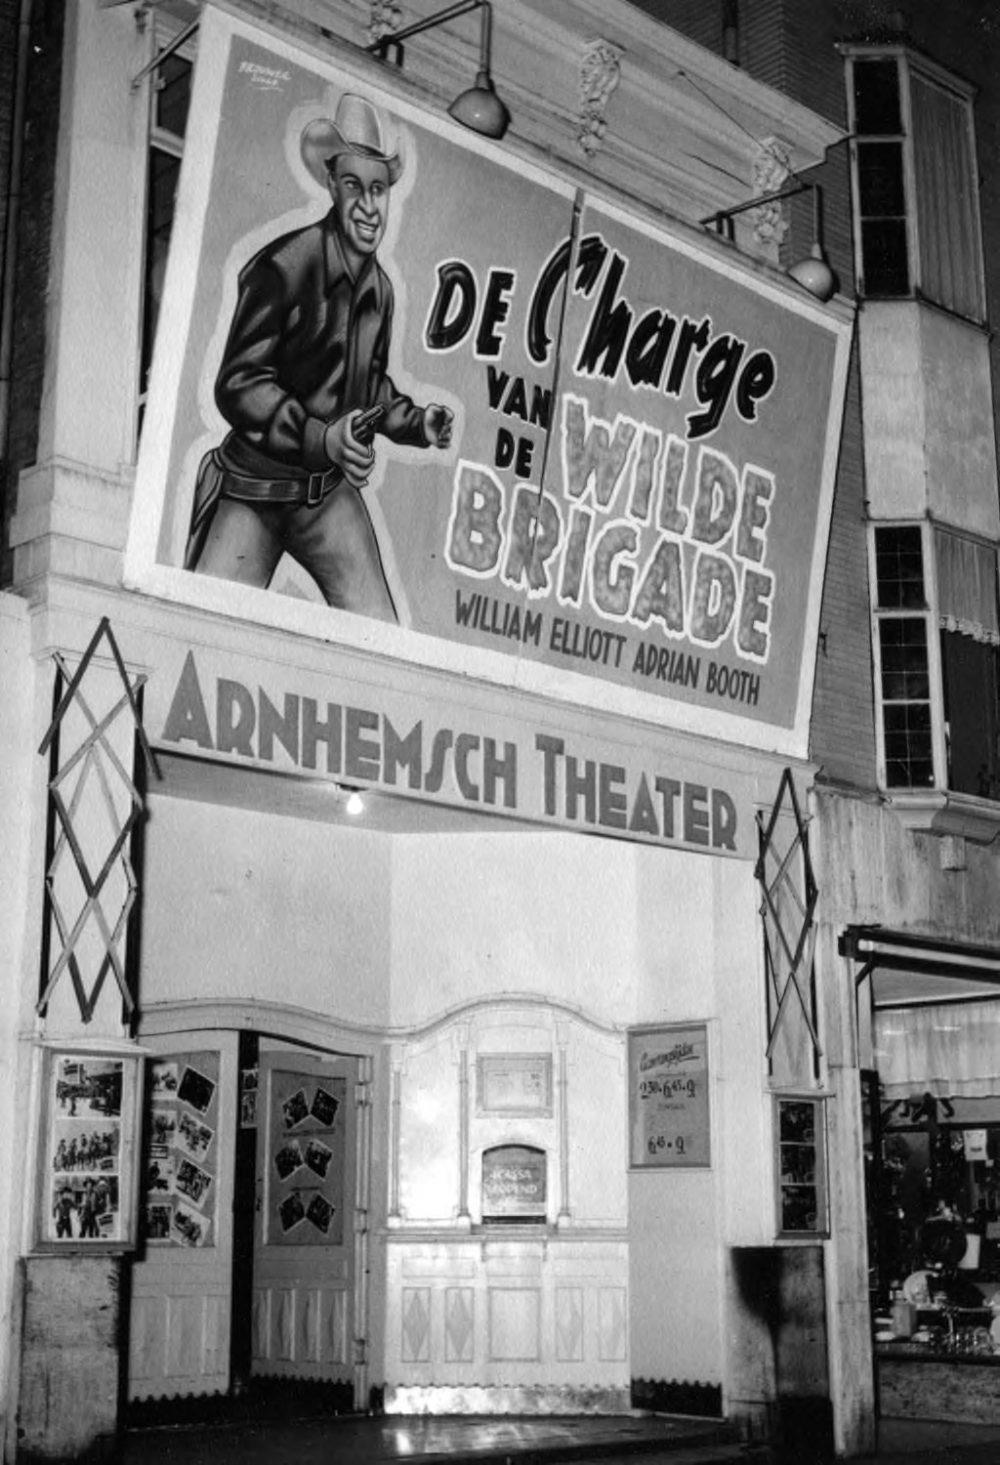 ketelstraat in arnhem arnhemsch theater